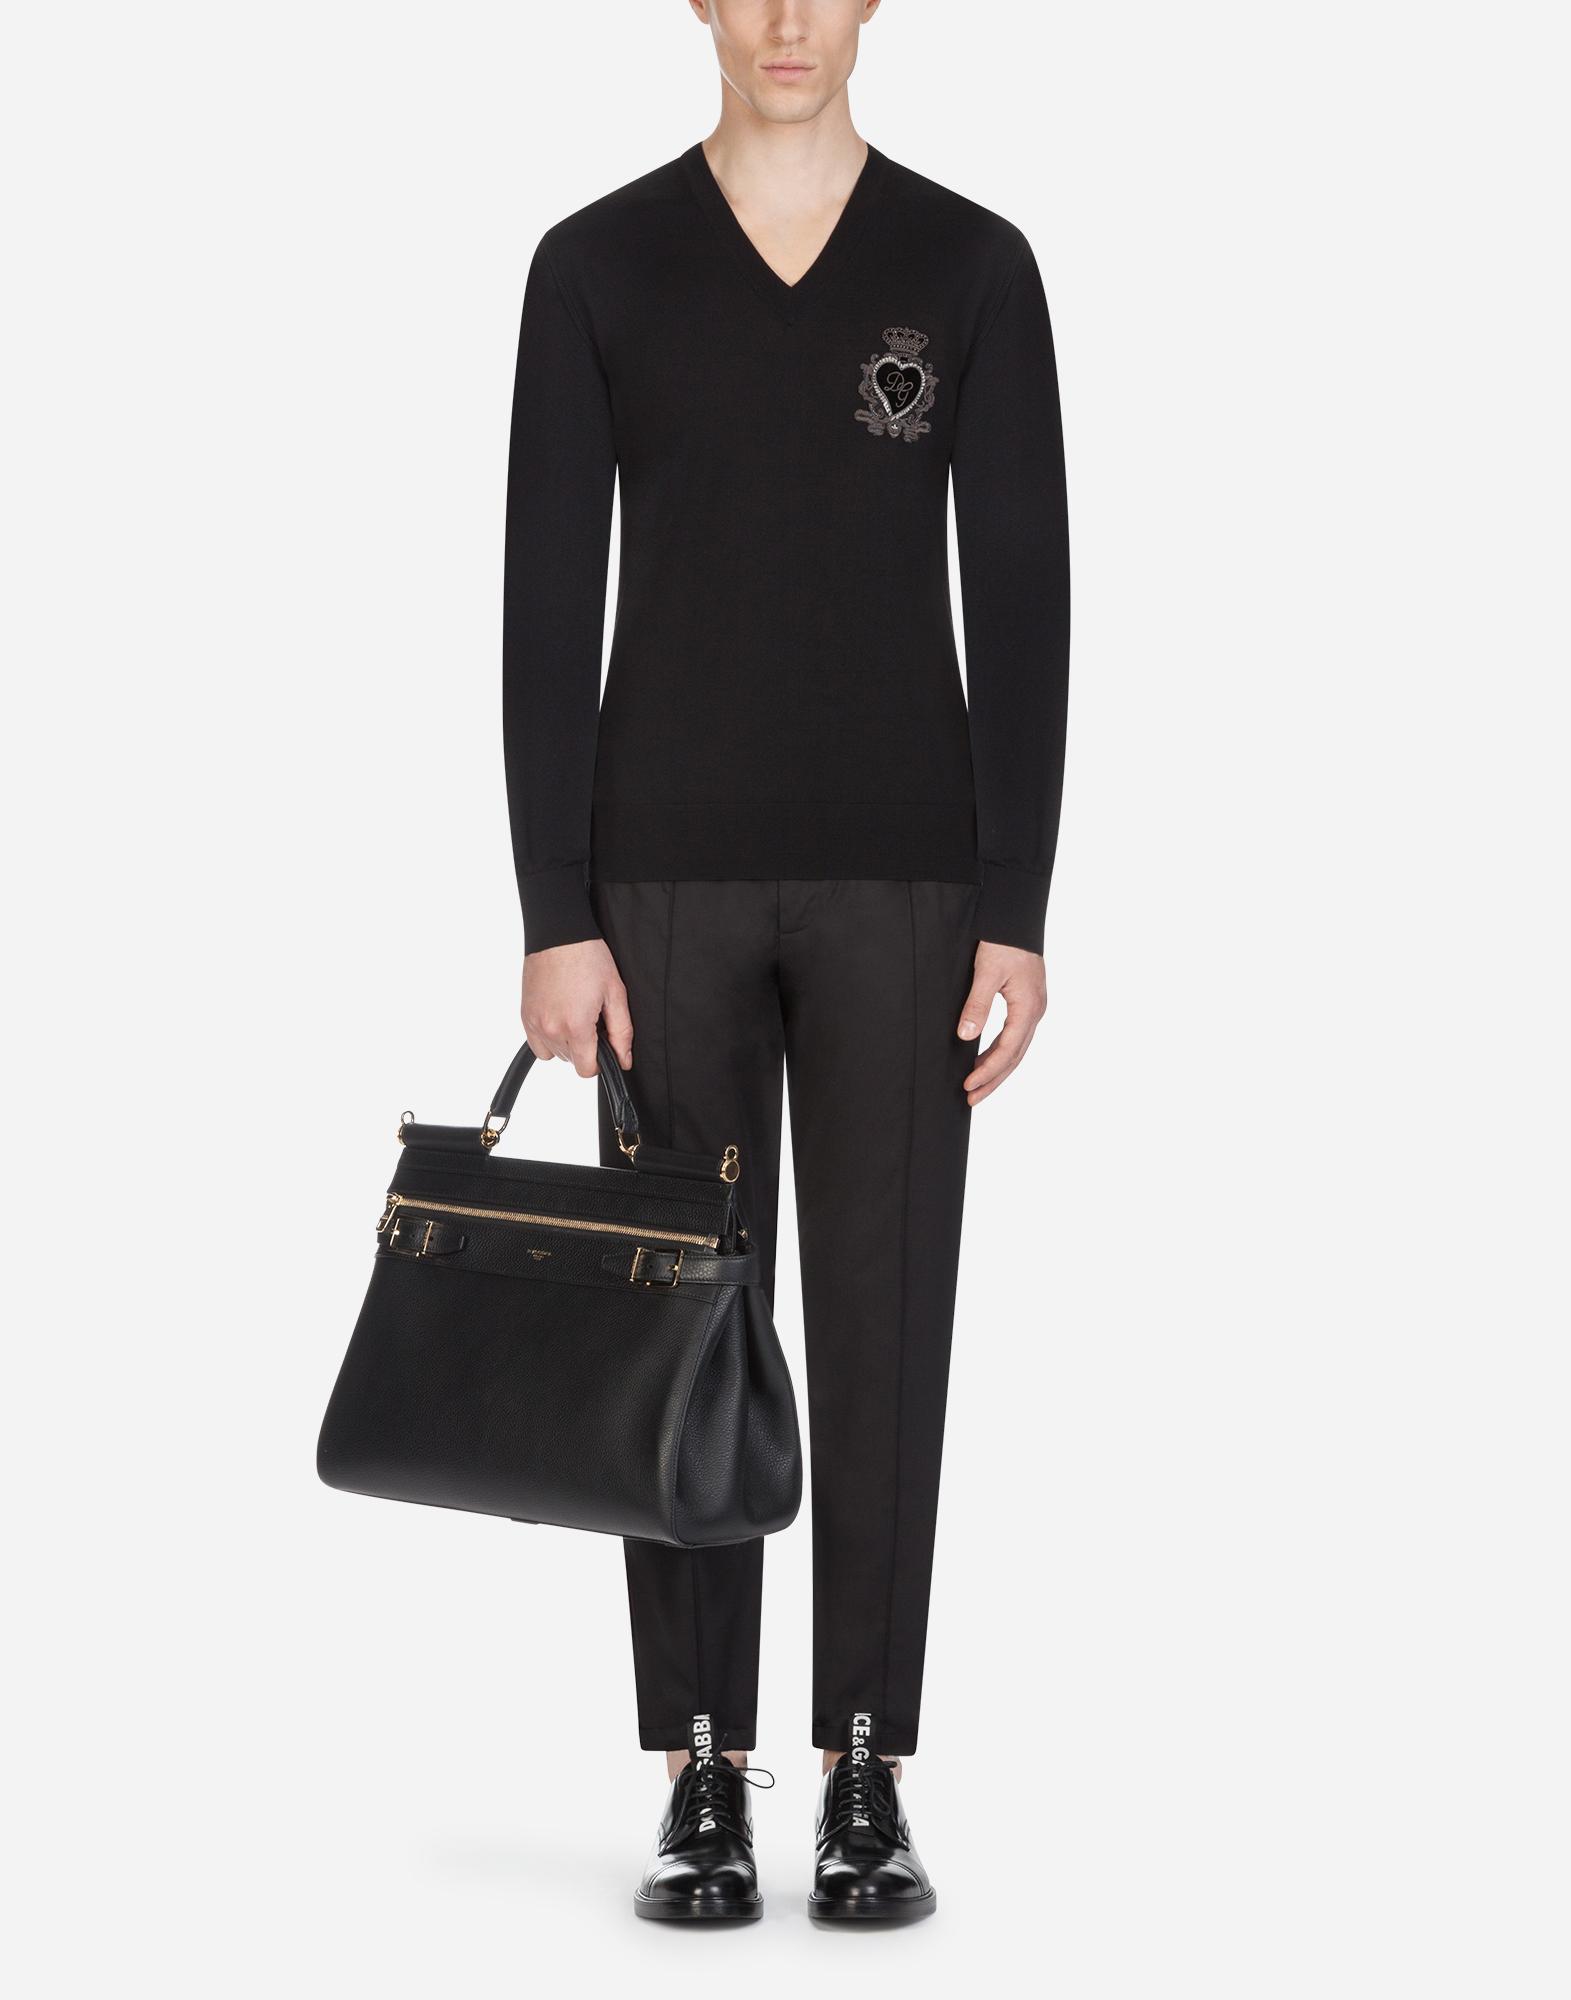 Dolce & Gabbana V-NECK WOOL KNIT WITH PATCH